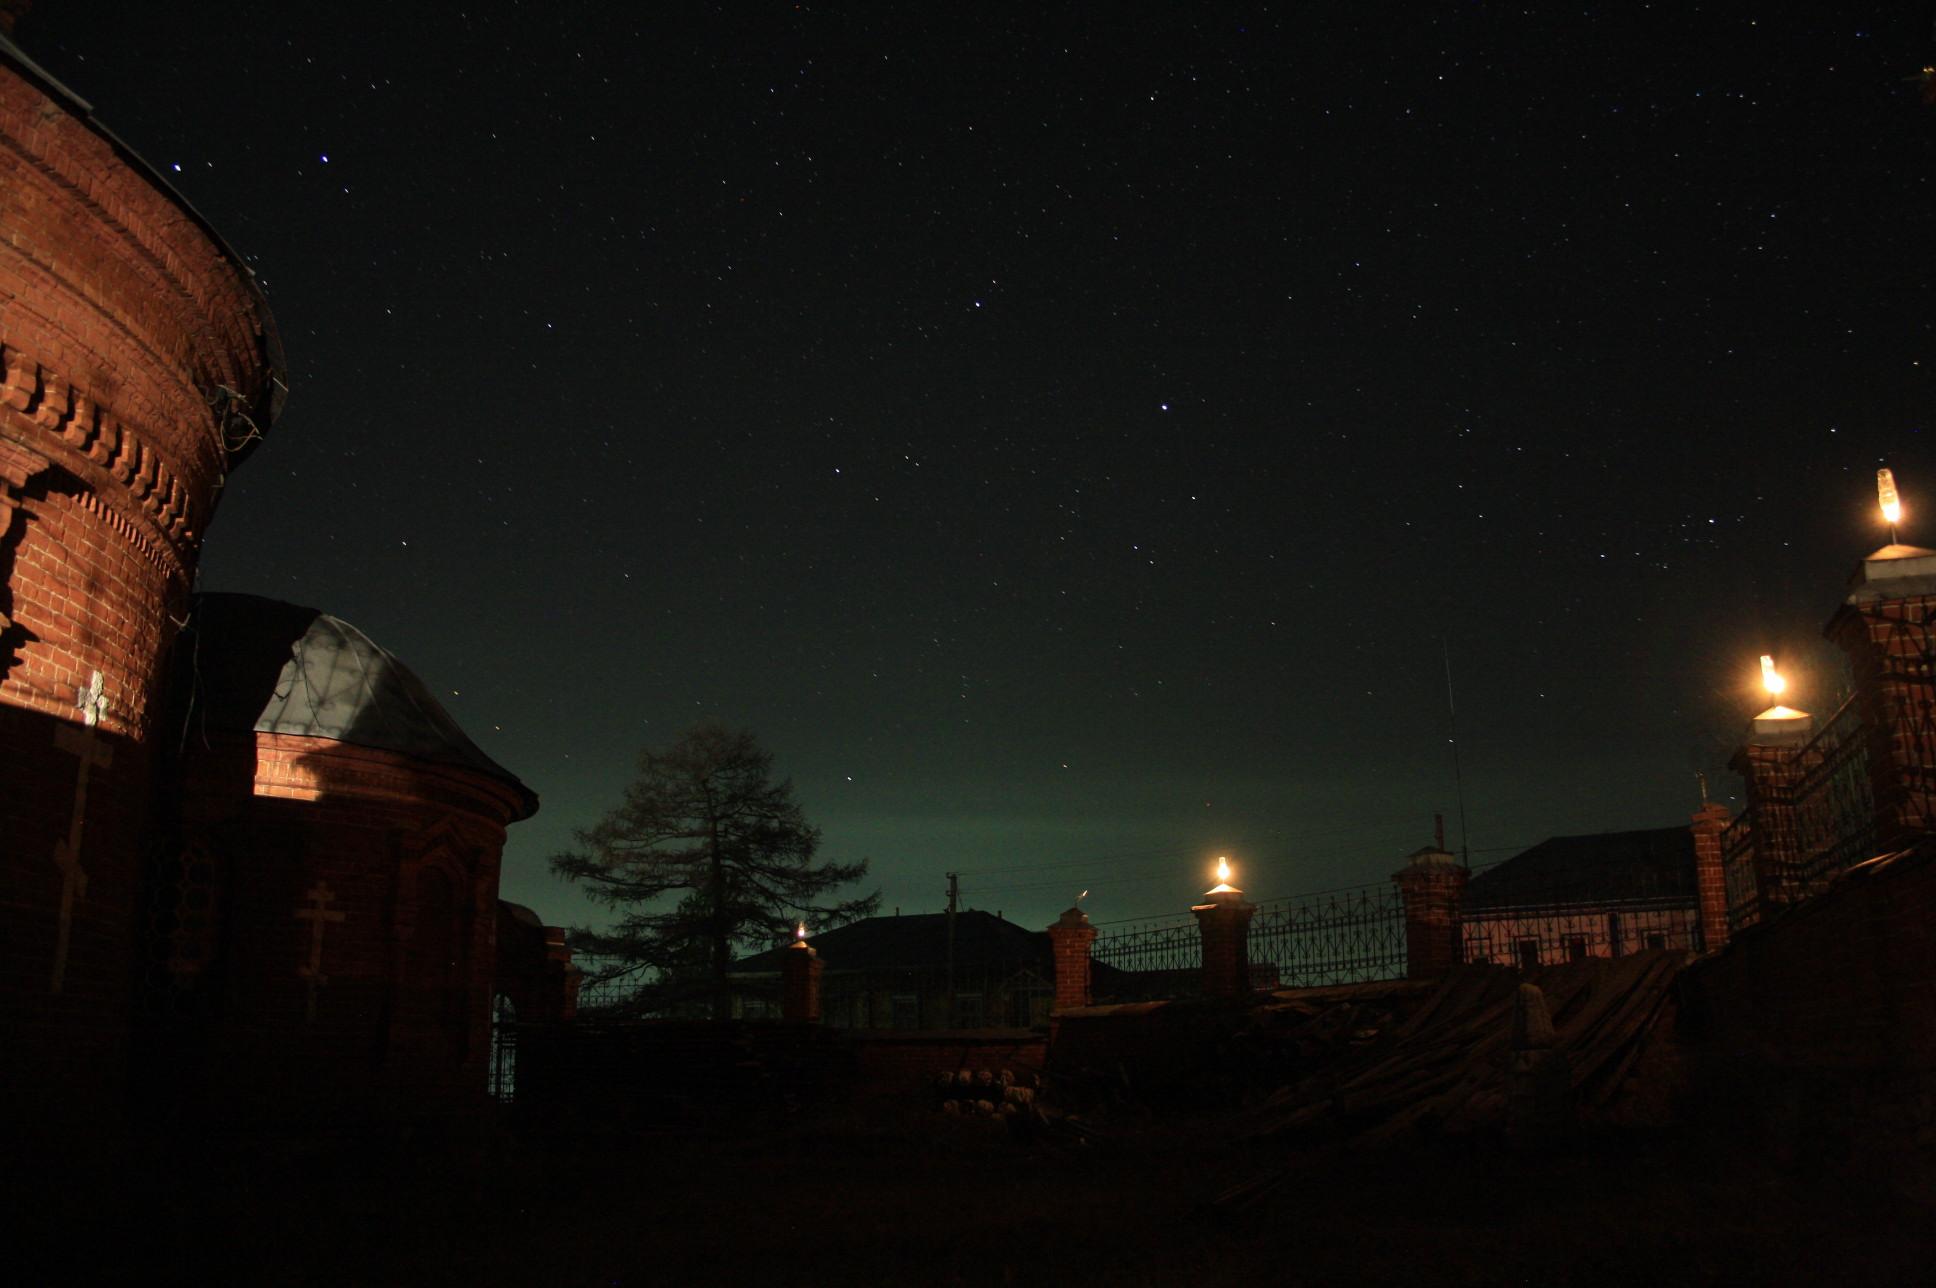 Кага. Пасха Небо на Востоке